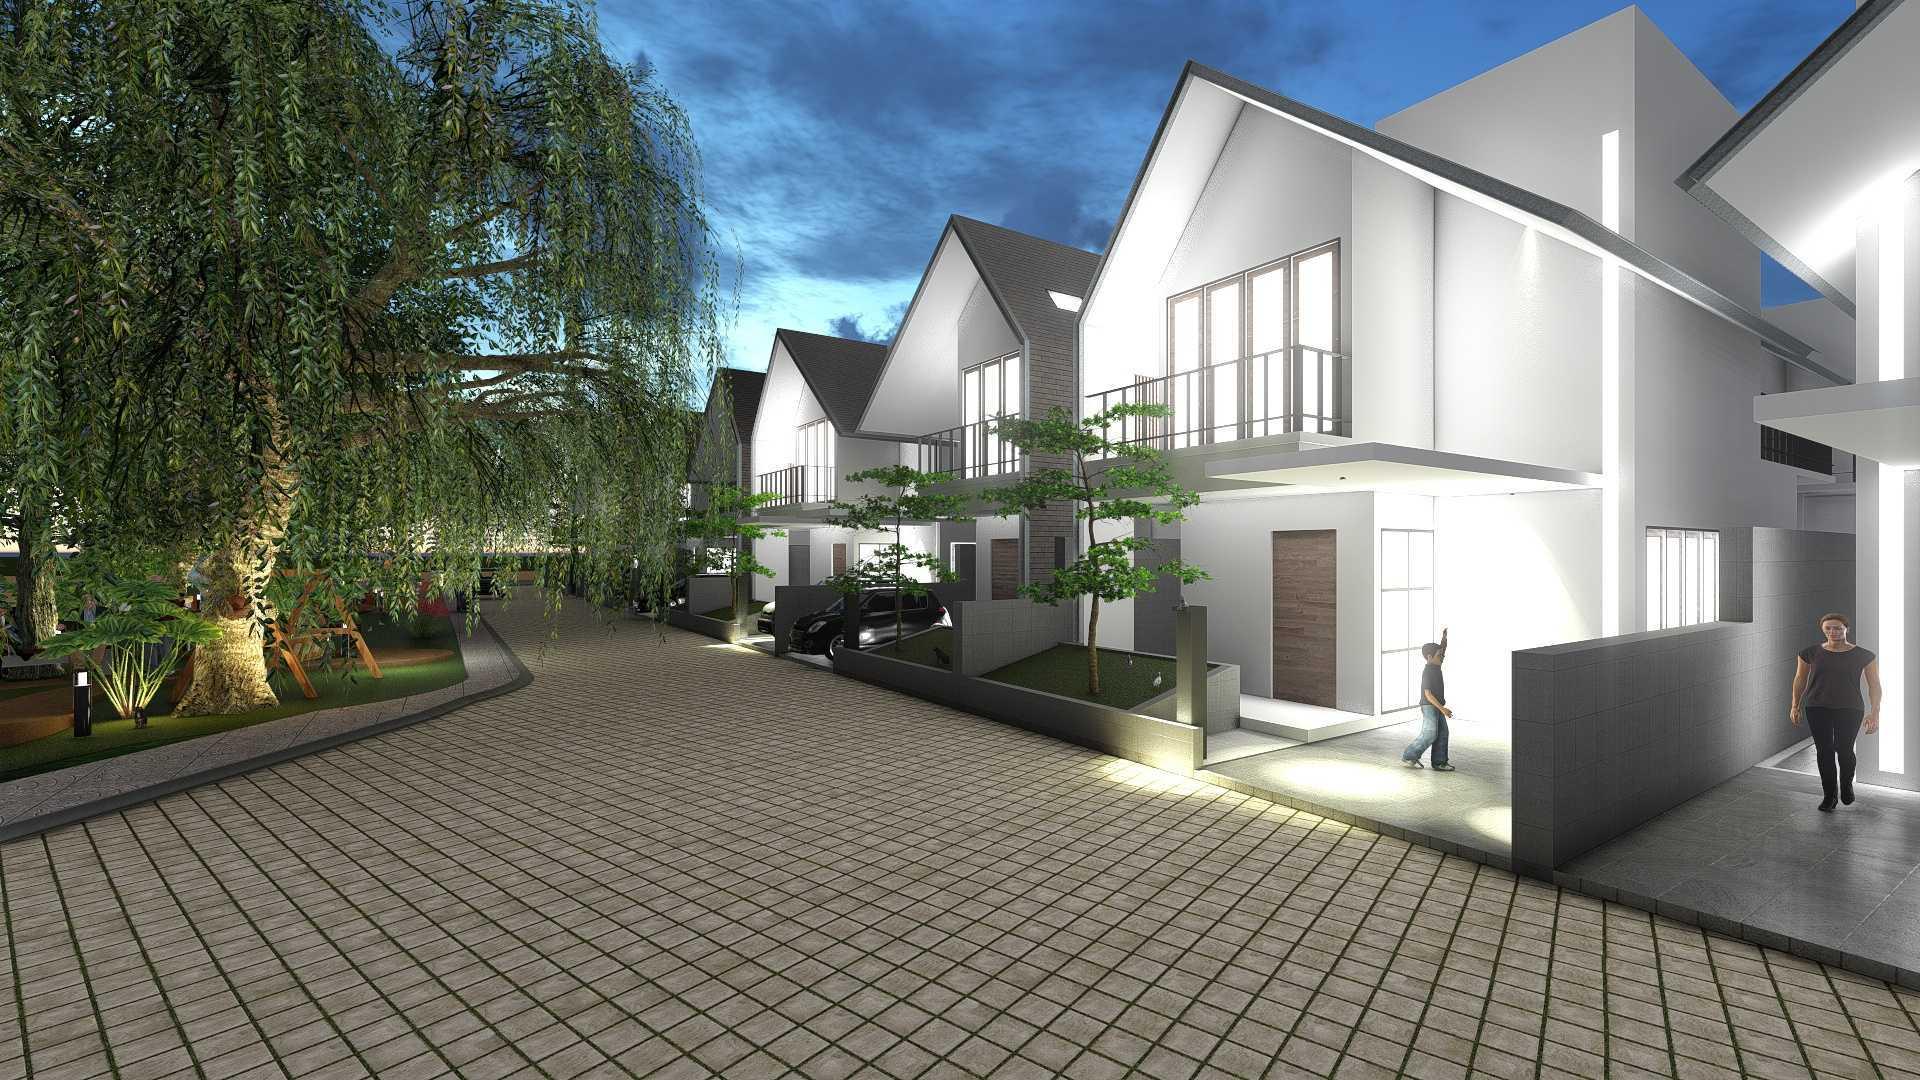 Samitrayasa Design Limo Housing Limo, Kota Depok, Jawa Barat, Indonesia Limo, Kota Depok, Jawa Barat, Indonesia 207 Tropis  32611